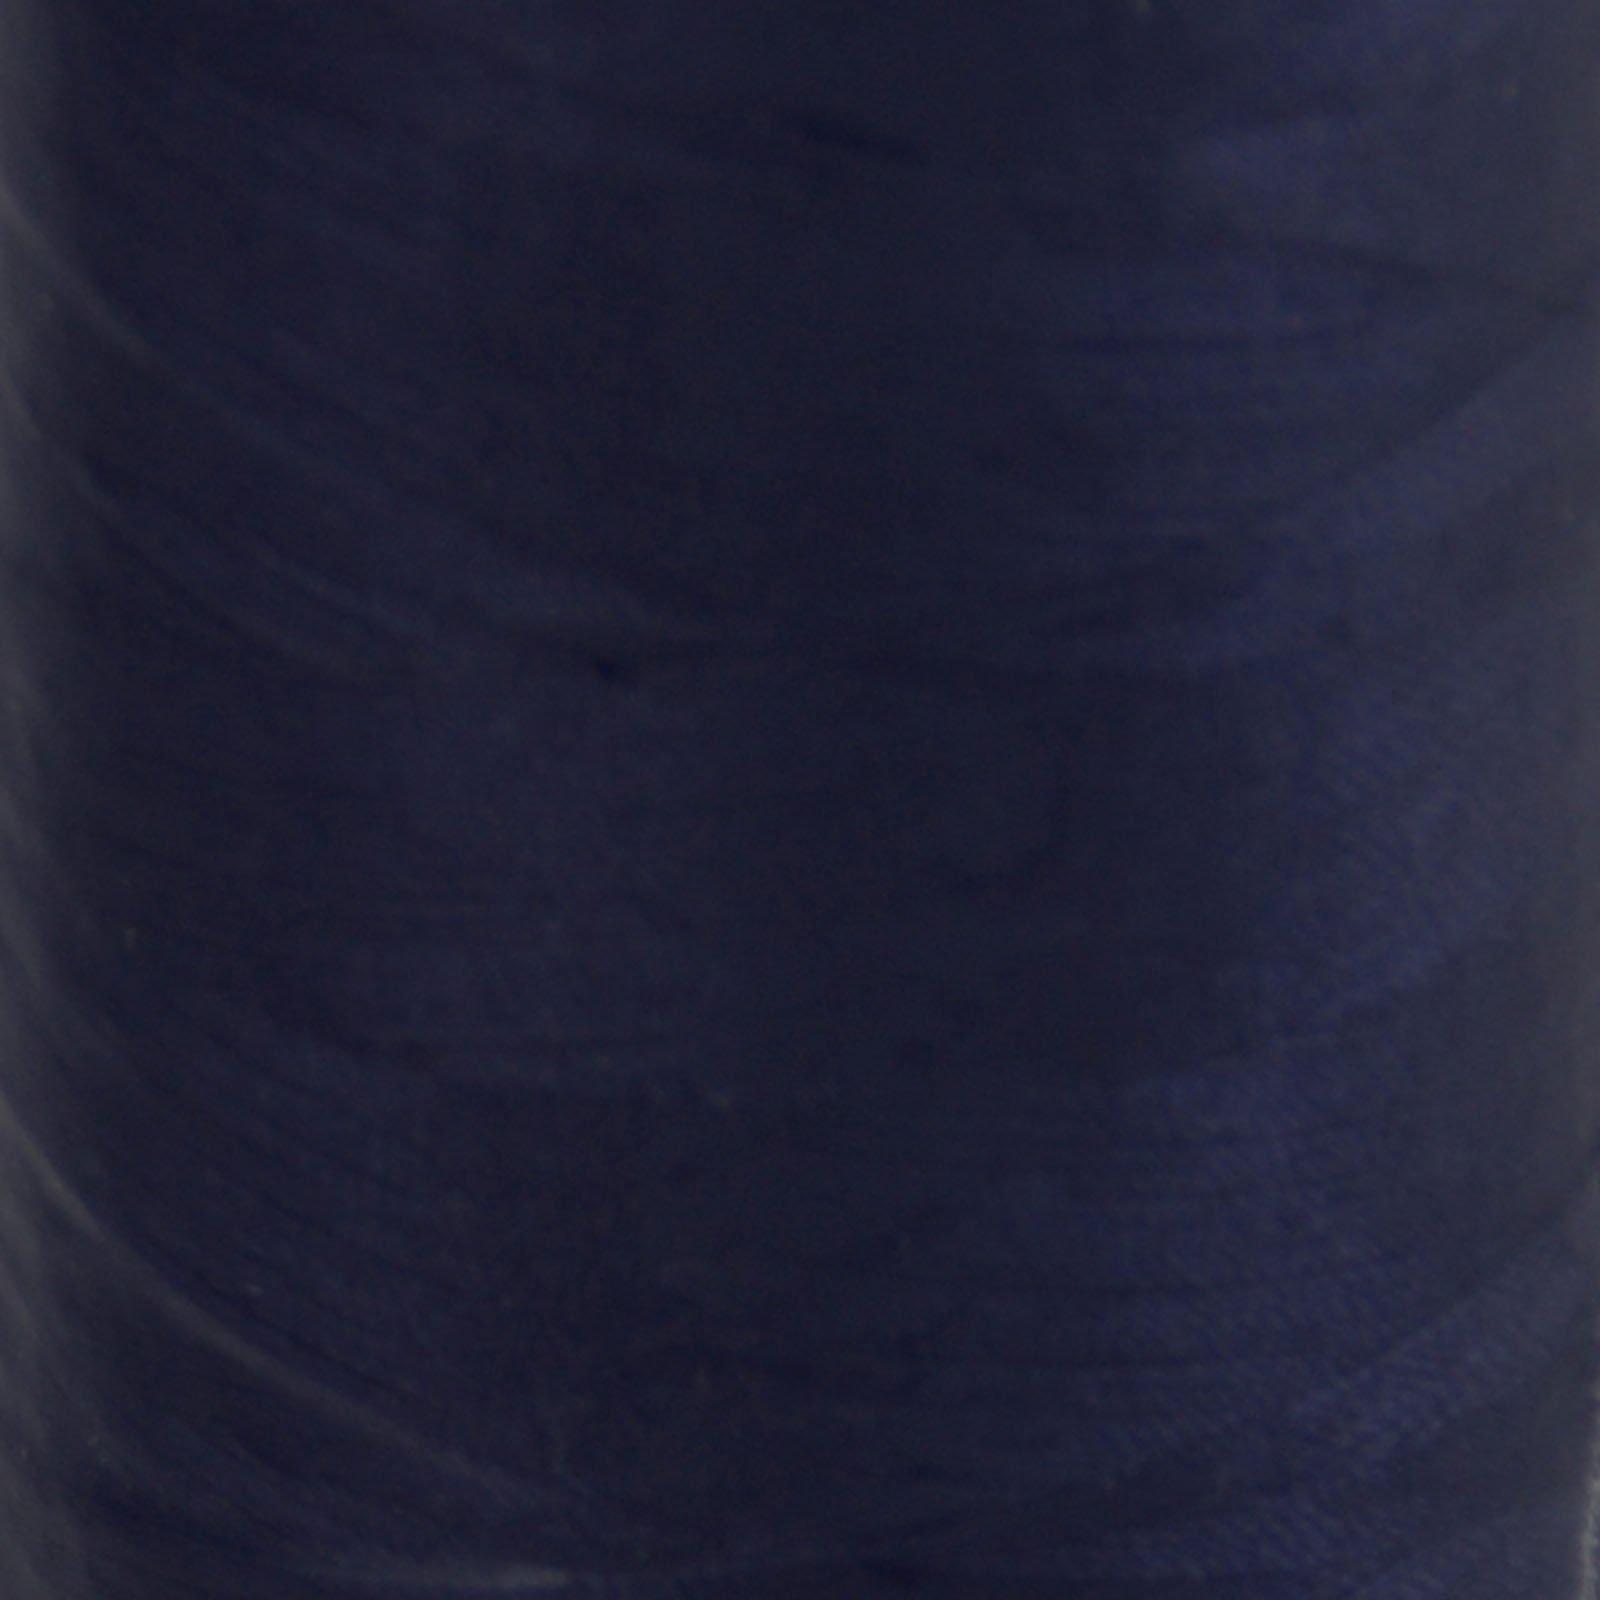 # 2785 Very Dark Navy